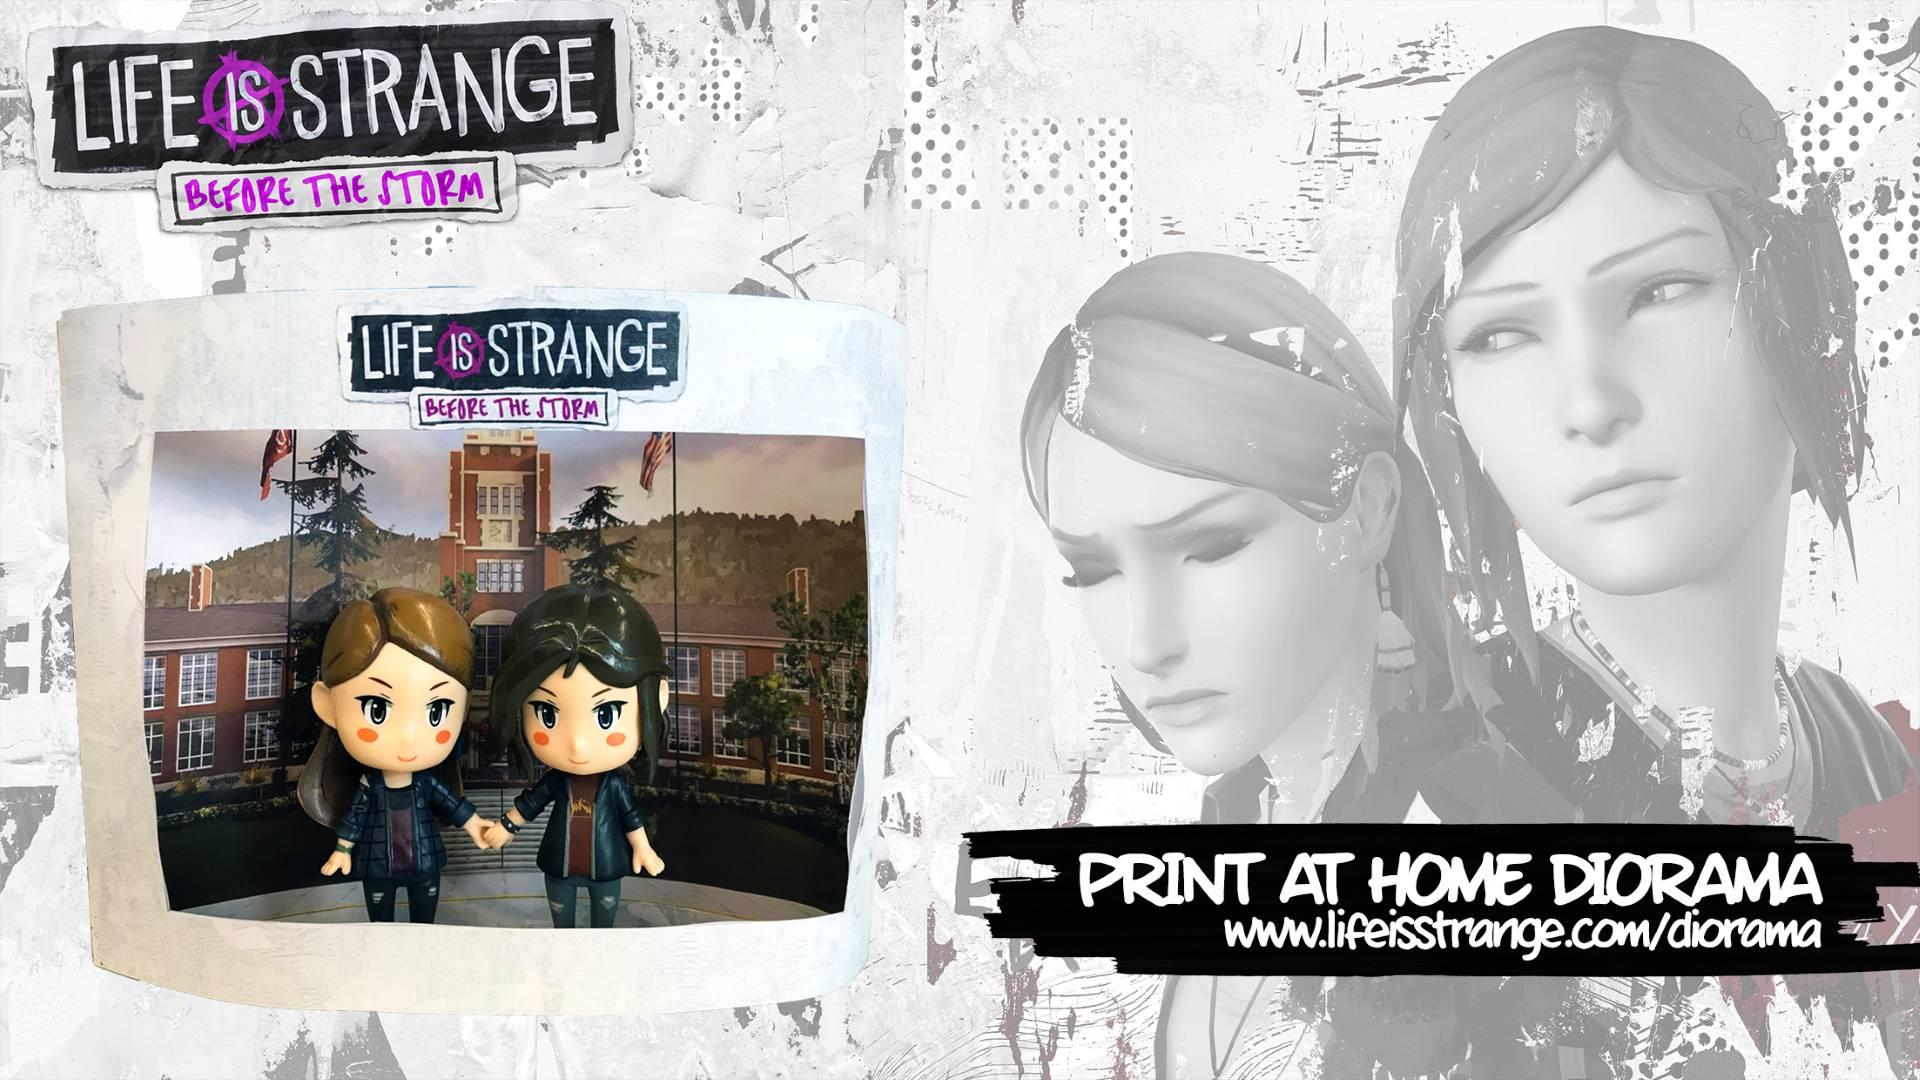 Диорама для фигурок Хлои и Рэйчел из Life is Strange: Before the Storm